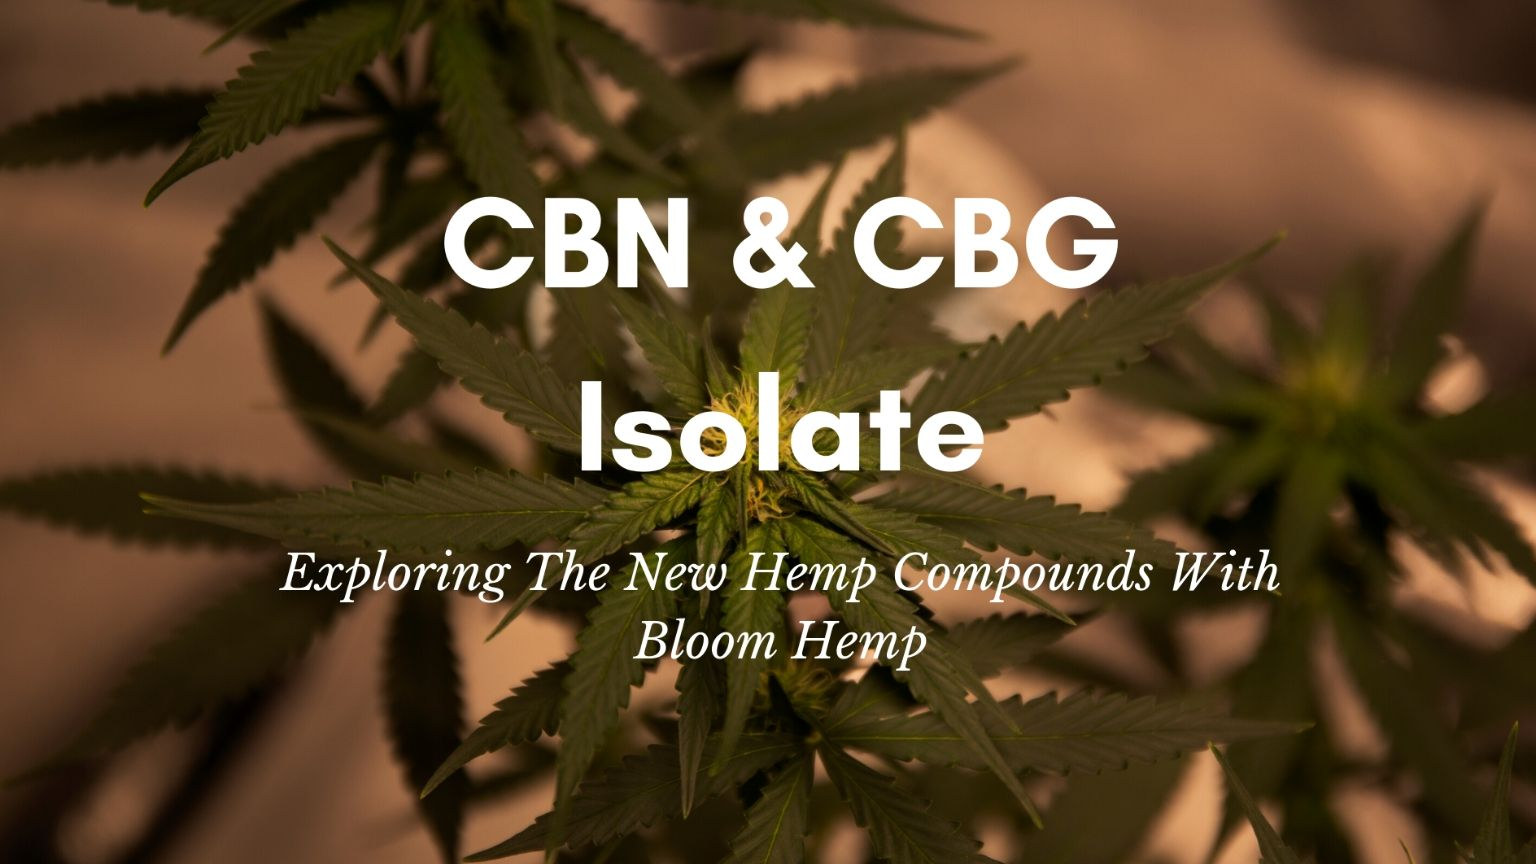 hemp plant and leaves